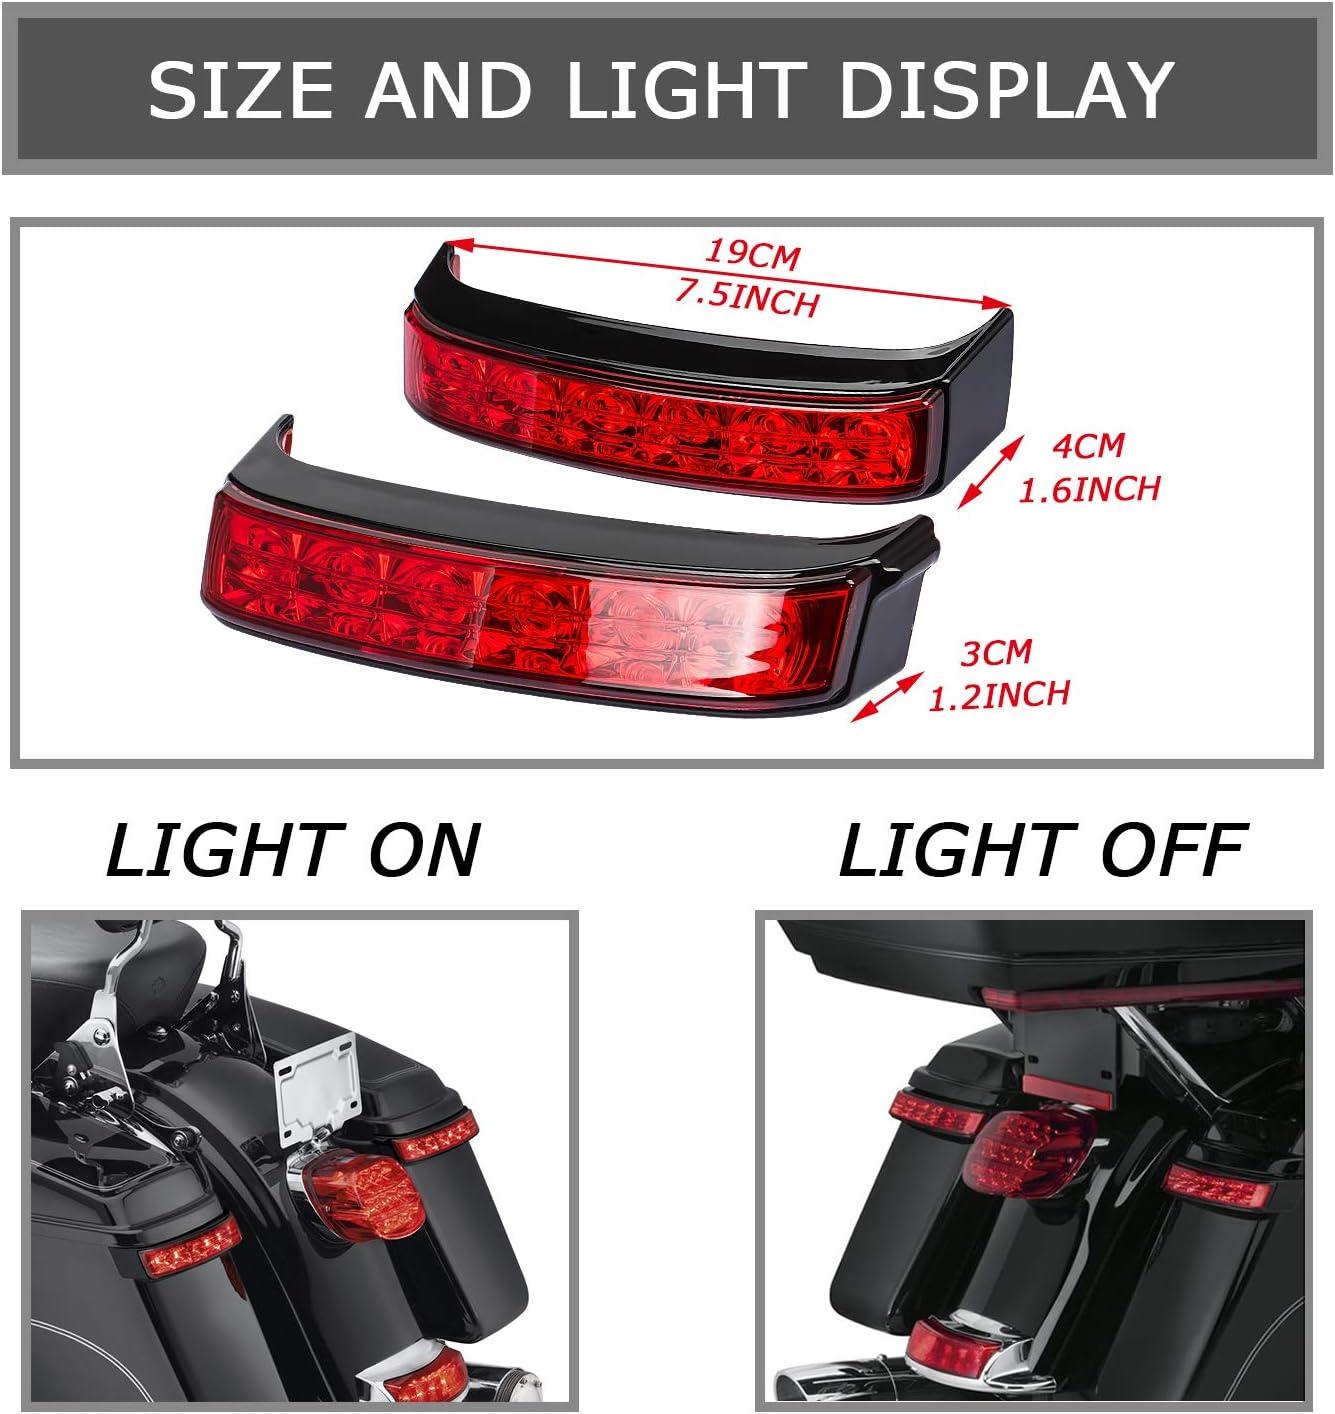 Saddlebag Housing Tail Run Brake Turn Light Lamp LED Len For Harley Touring Street Road Glide CVO Electra Glide Ultra Classic Ultra Limited CVO 2014-2020 Black Red